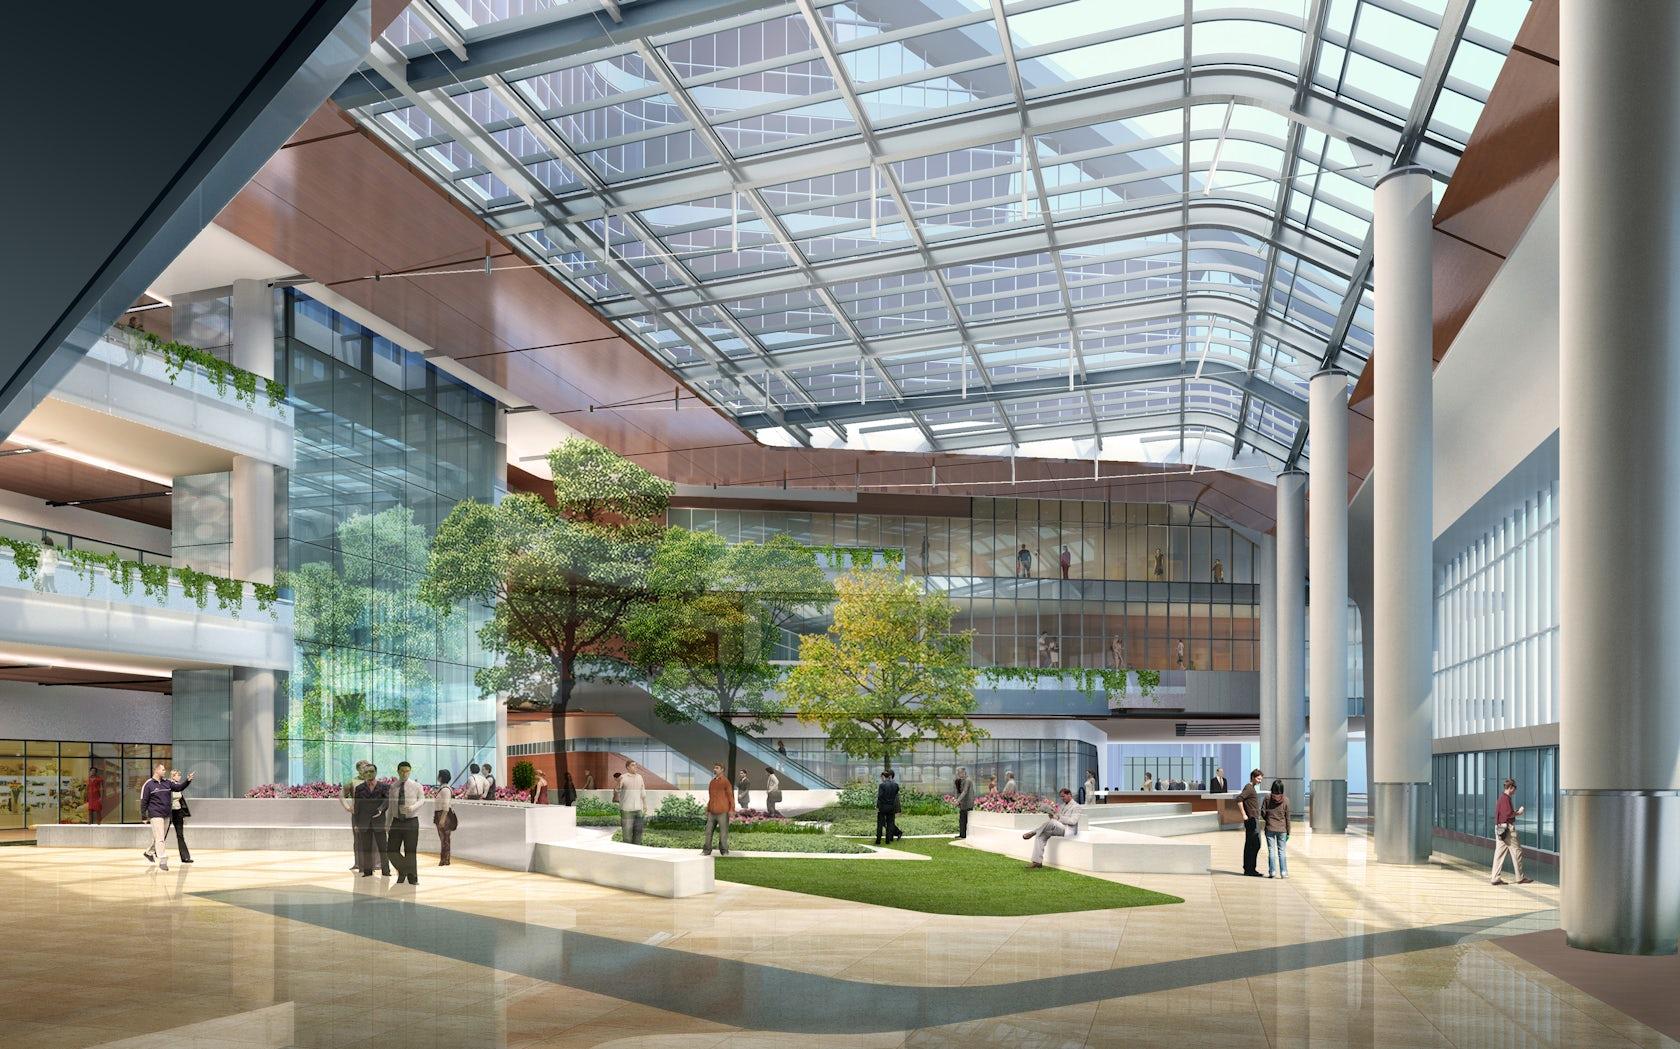 Shanghai new hongqiao international medical center shared - San diego interior design center ...